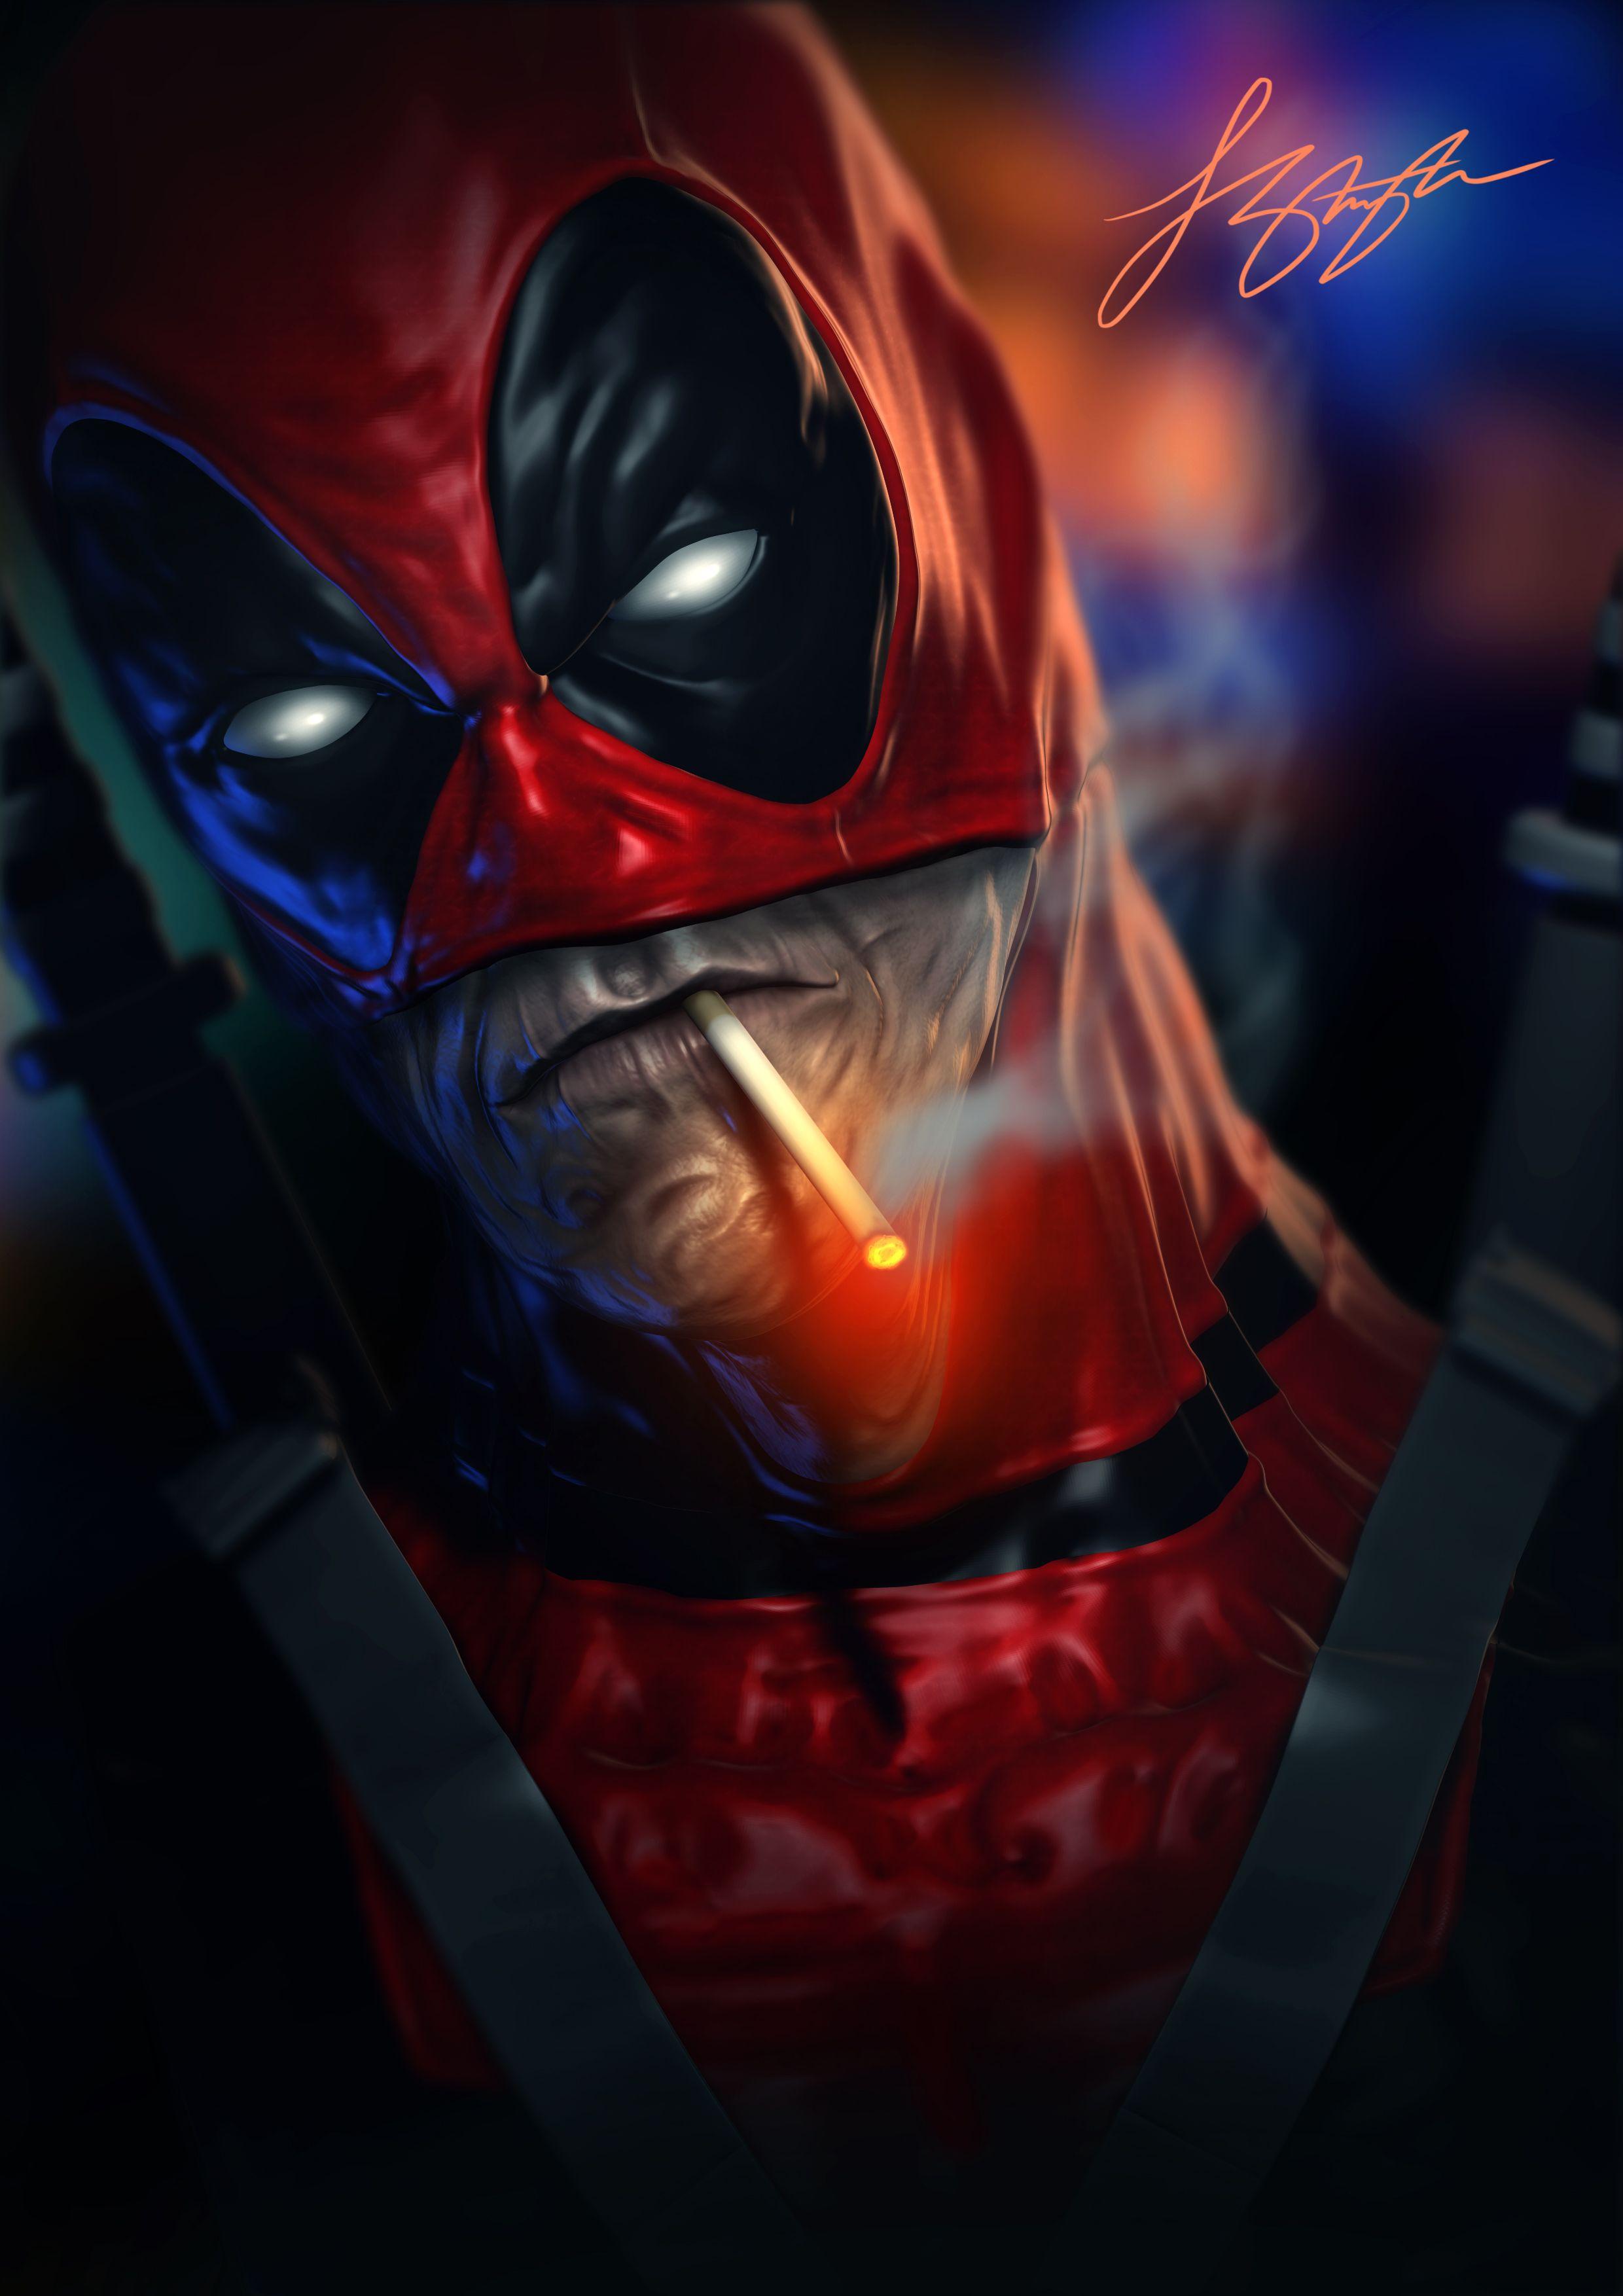 #Deadpool #Fan #Art. (D-Pooly) By: Liquid-Venom. (THE * 5 * STÅR * ÅWARD * OF: * AW YEAH, IT'S MAJOR ÅWESOMENESS!!!™)[THANK U 4 PINNING!!!<·><]<©>ÅÅÅ+(OB4E)